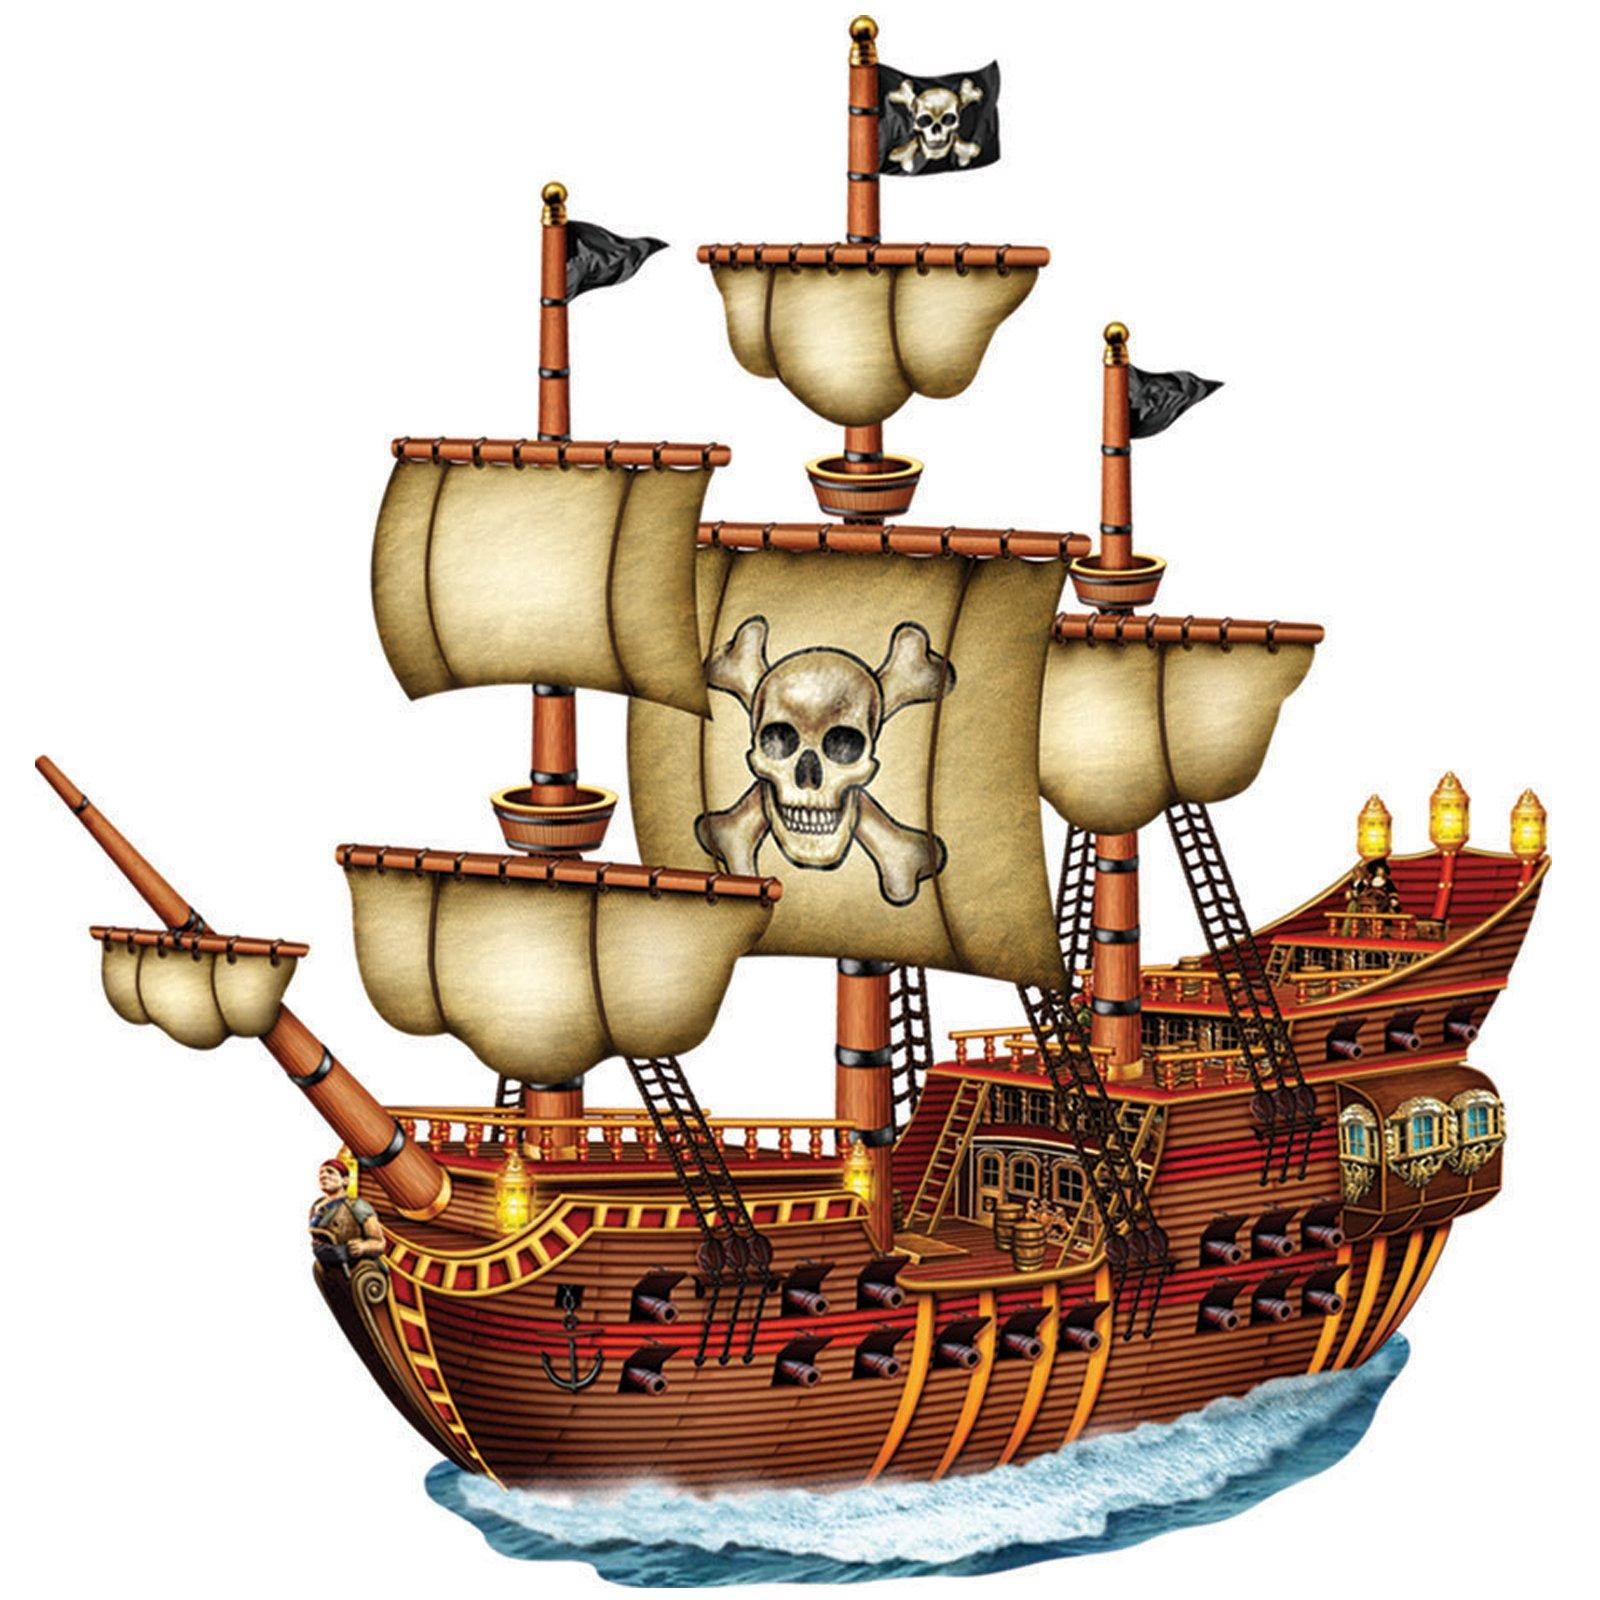 Big pirate ship clipart clip free download Free Pirate Ship Image, Download Free Clip Art, Free Clip Art on ... clip free download